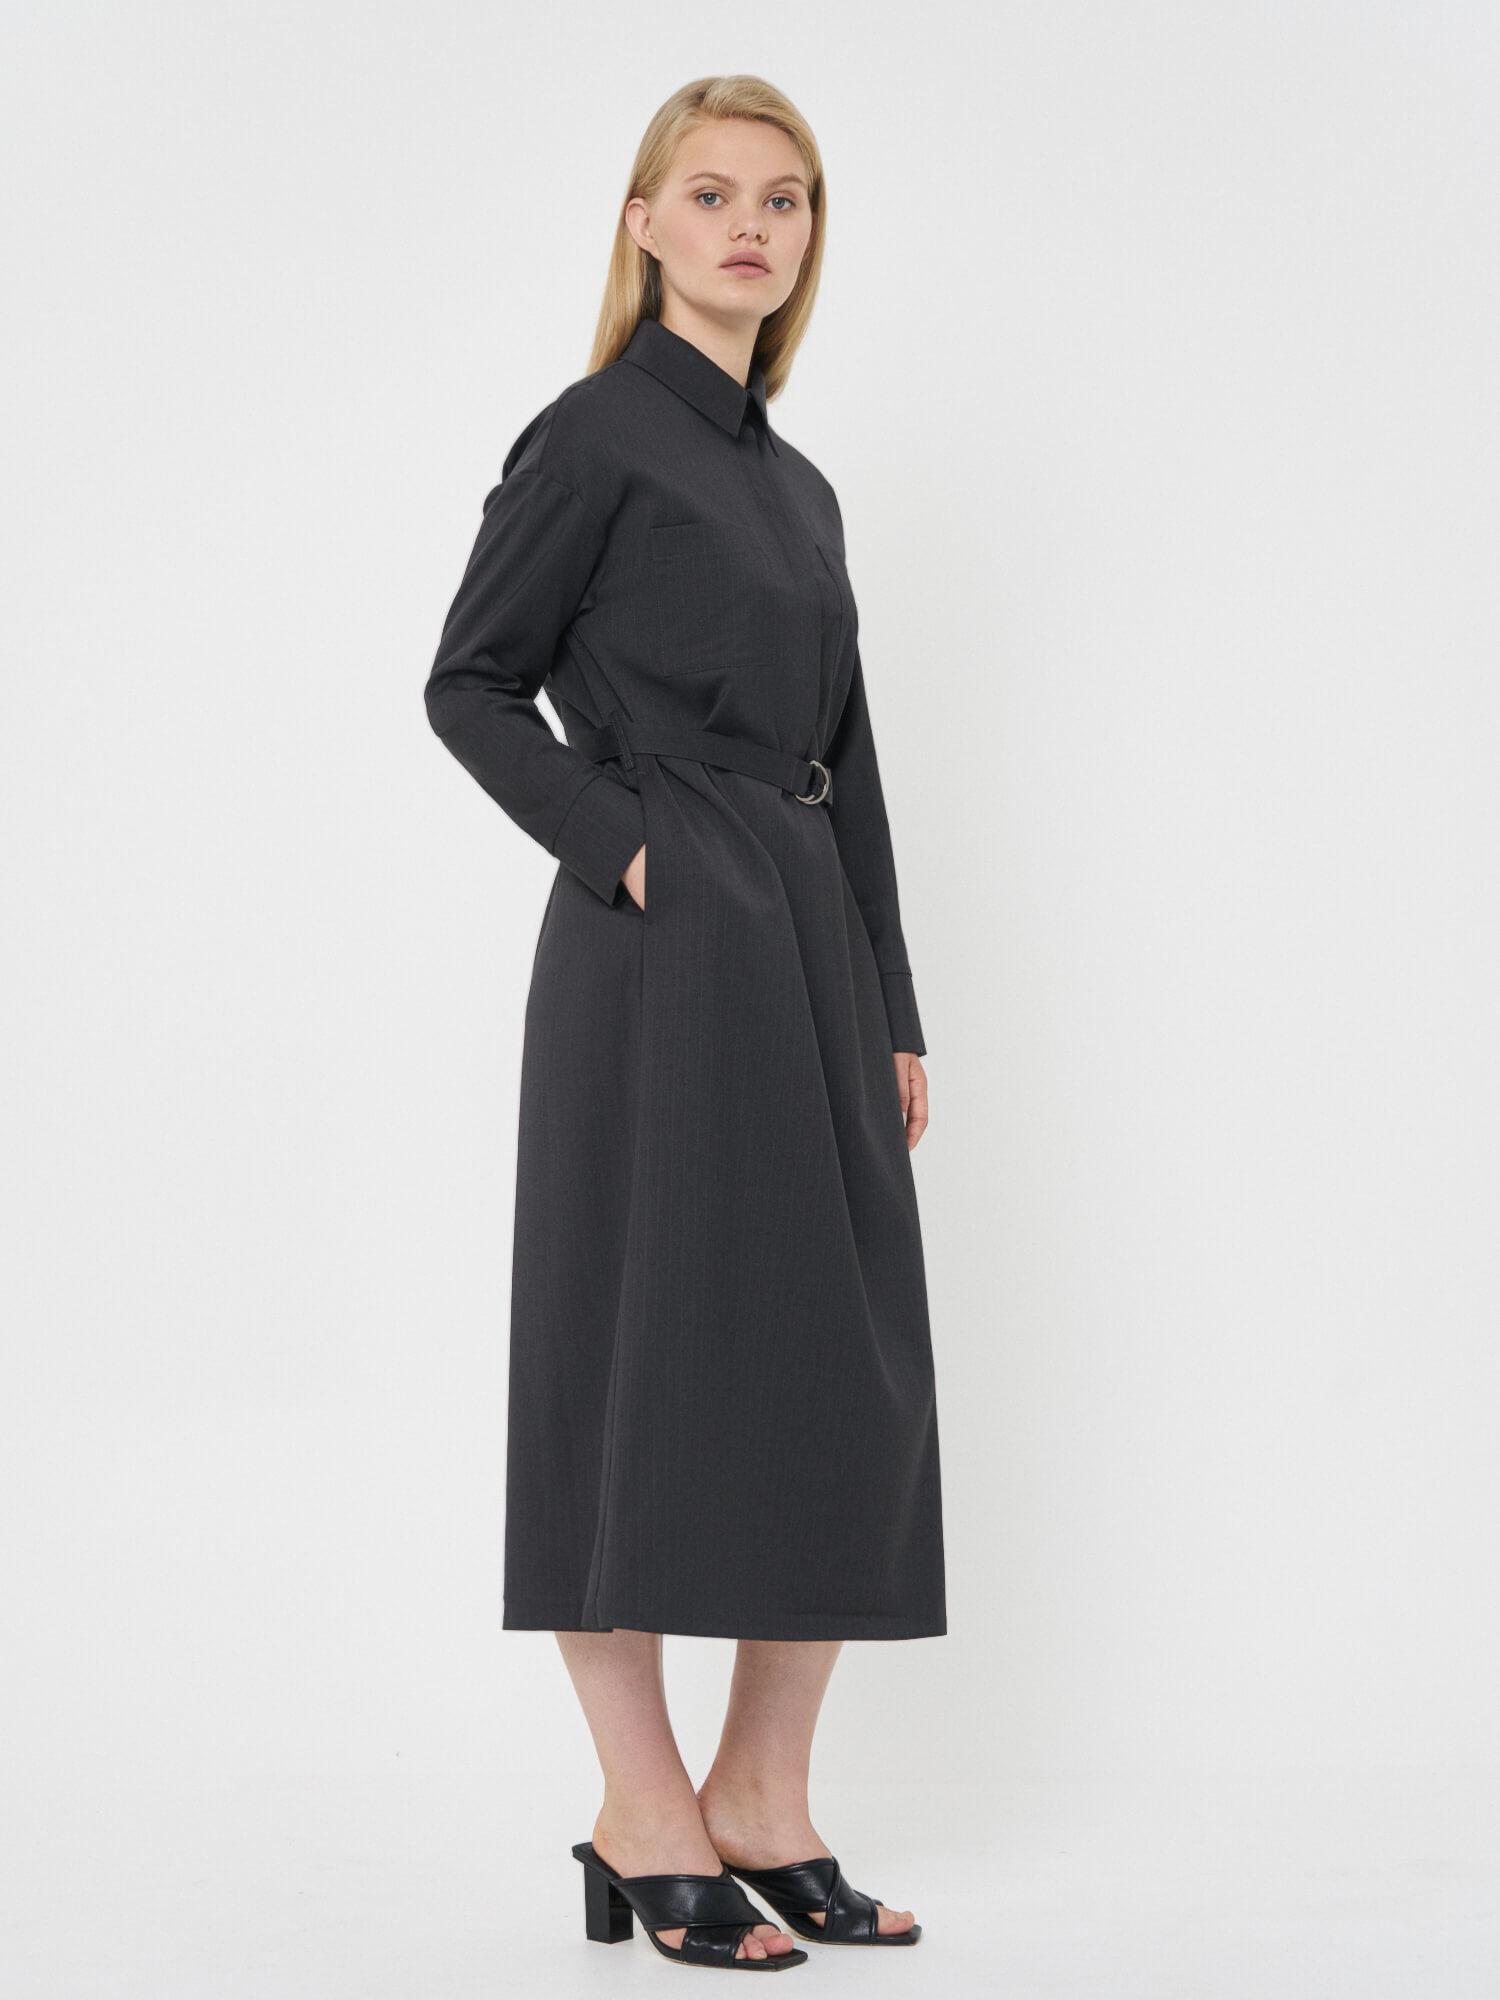 Платье-рубашка Kamila, Темно-серый